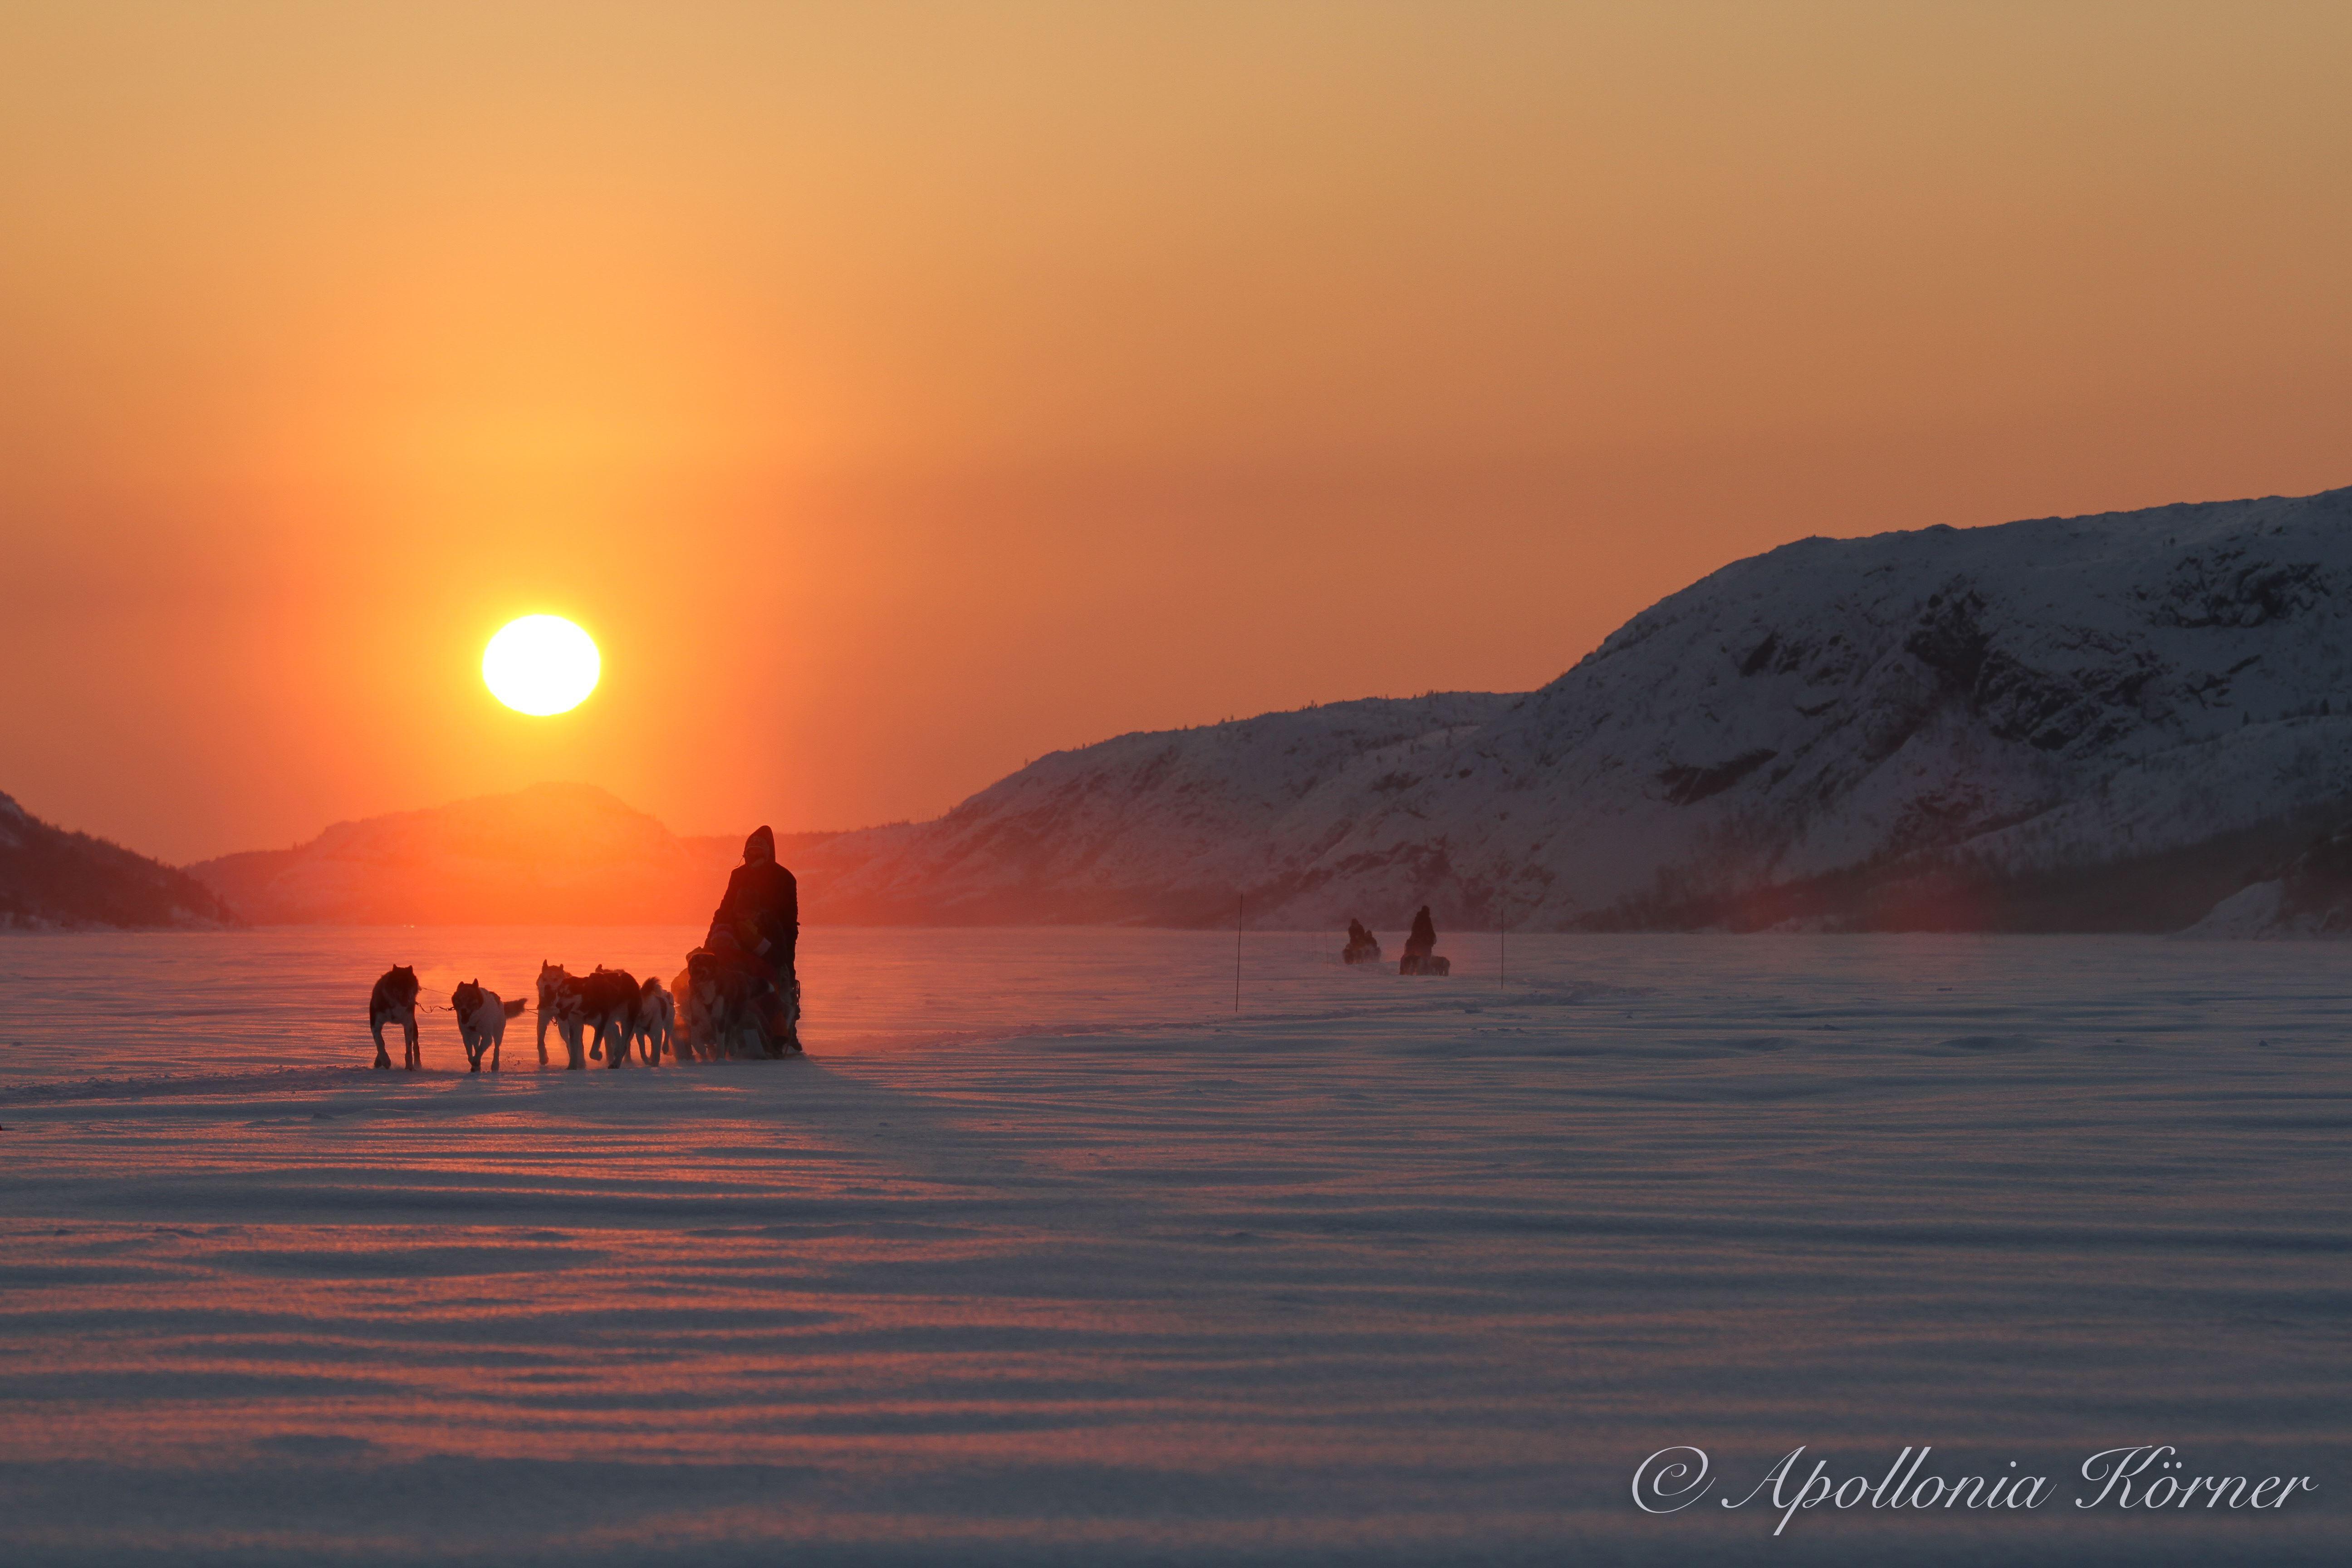 © Snowhotel Kirkenes, Snowhotel Kirkenes - Husky safari 2 hours